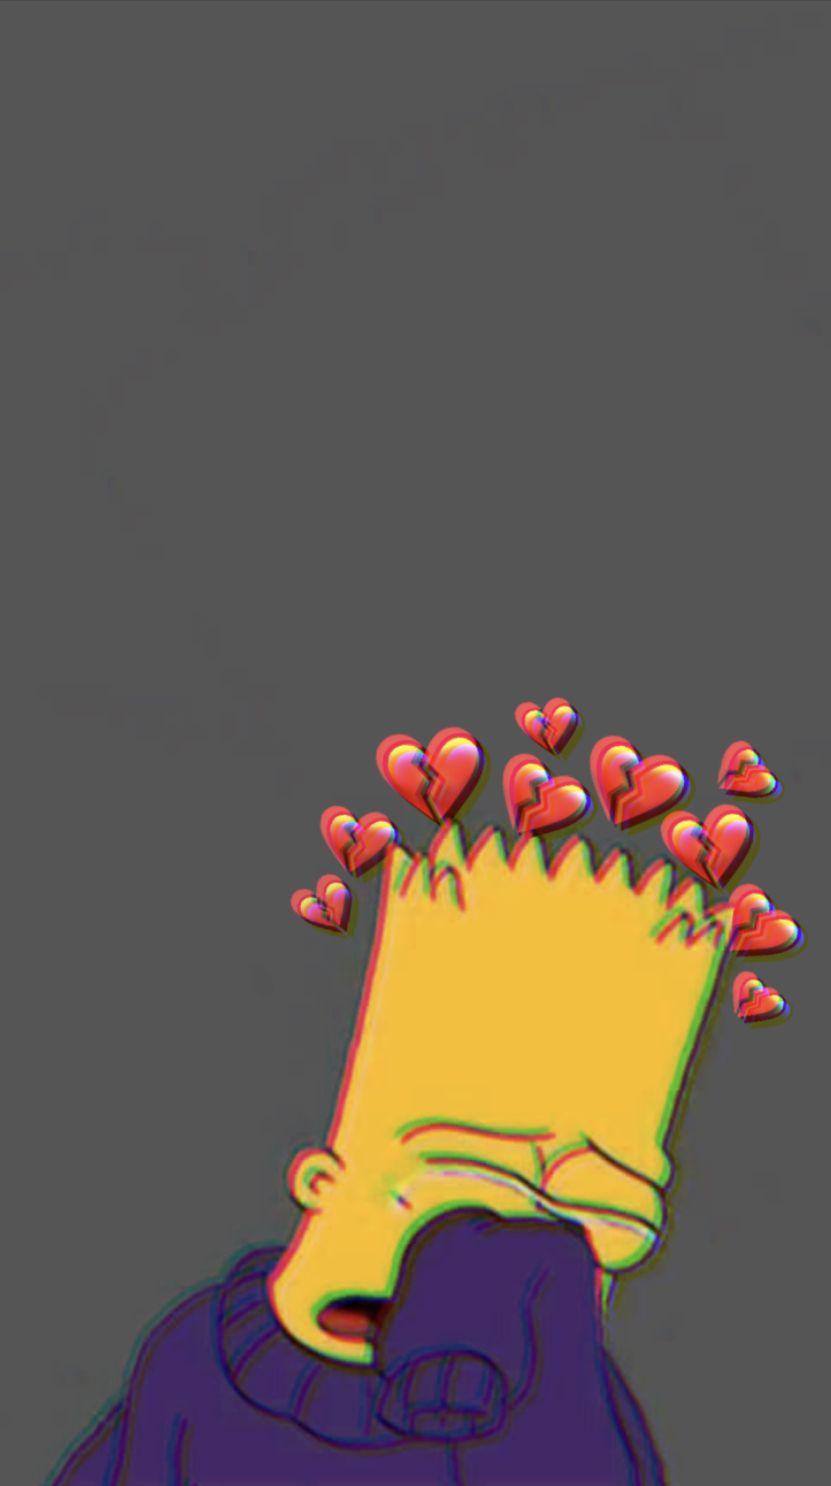 Pin By Crislane Fagundes On Bhe Broken Heart Wallpaper Heart Wallpaper Broken Heart Emoji